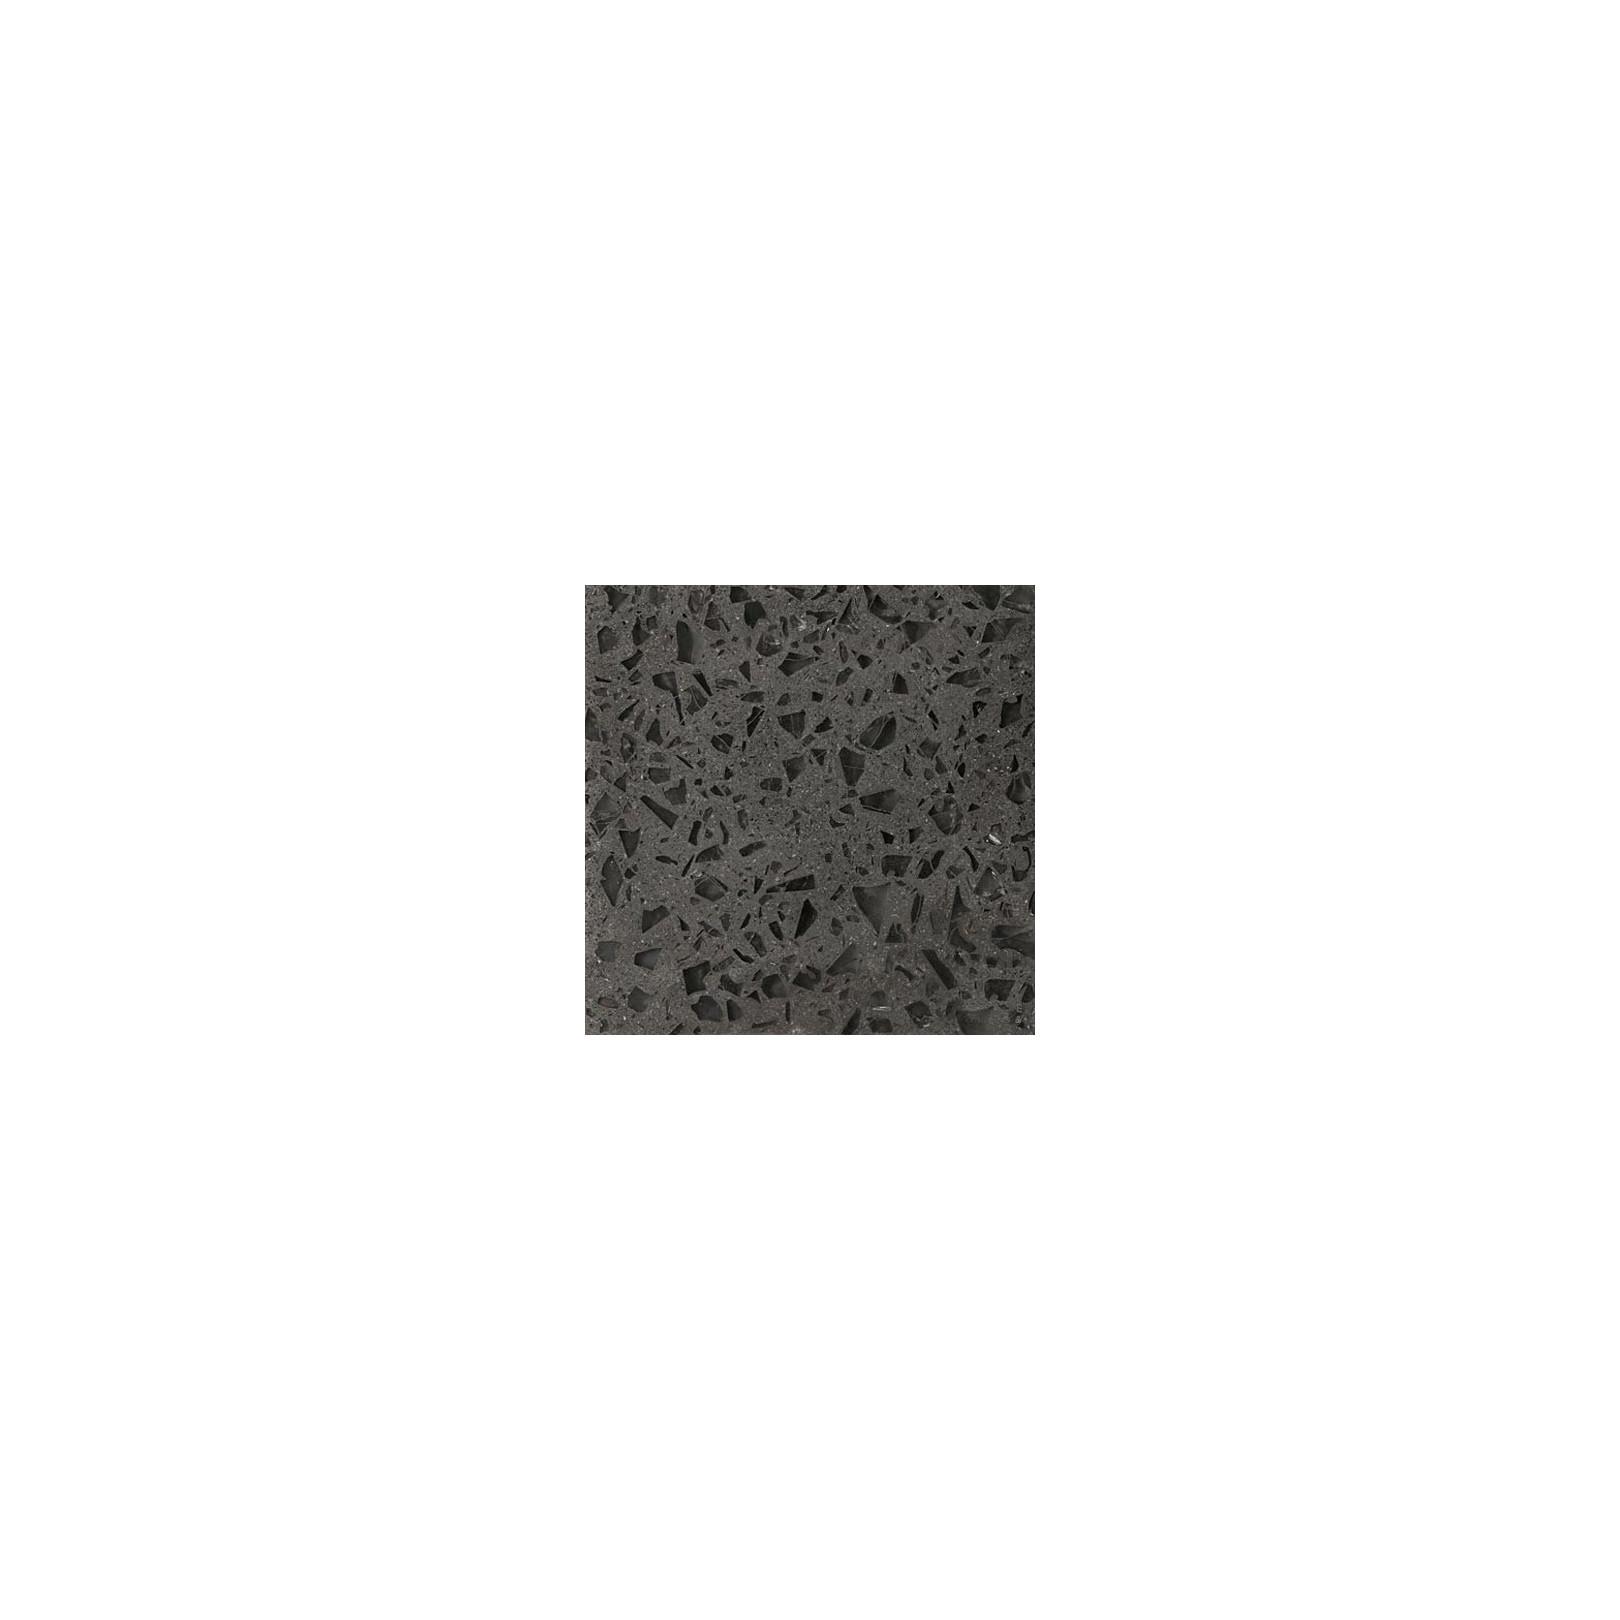 Carreau Terrazzo uni noir inclusions verre TU01V, 20x20cm